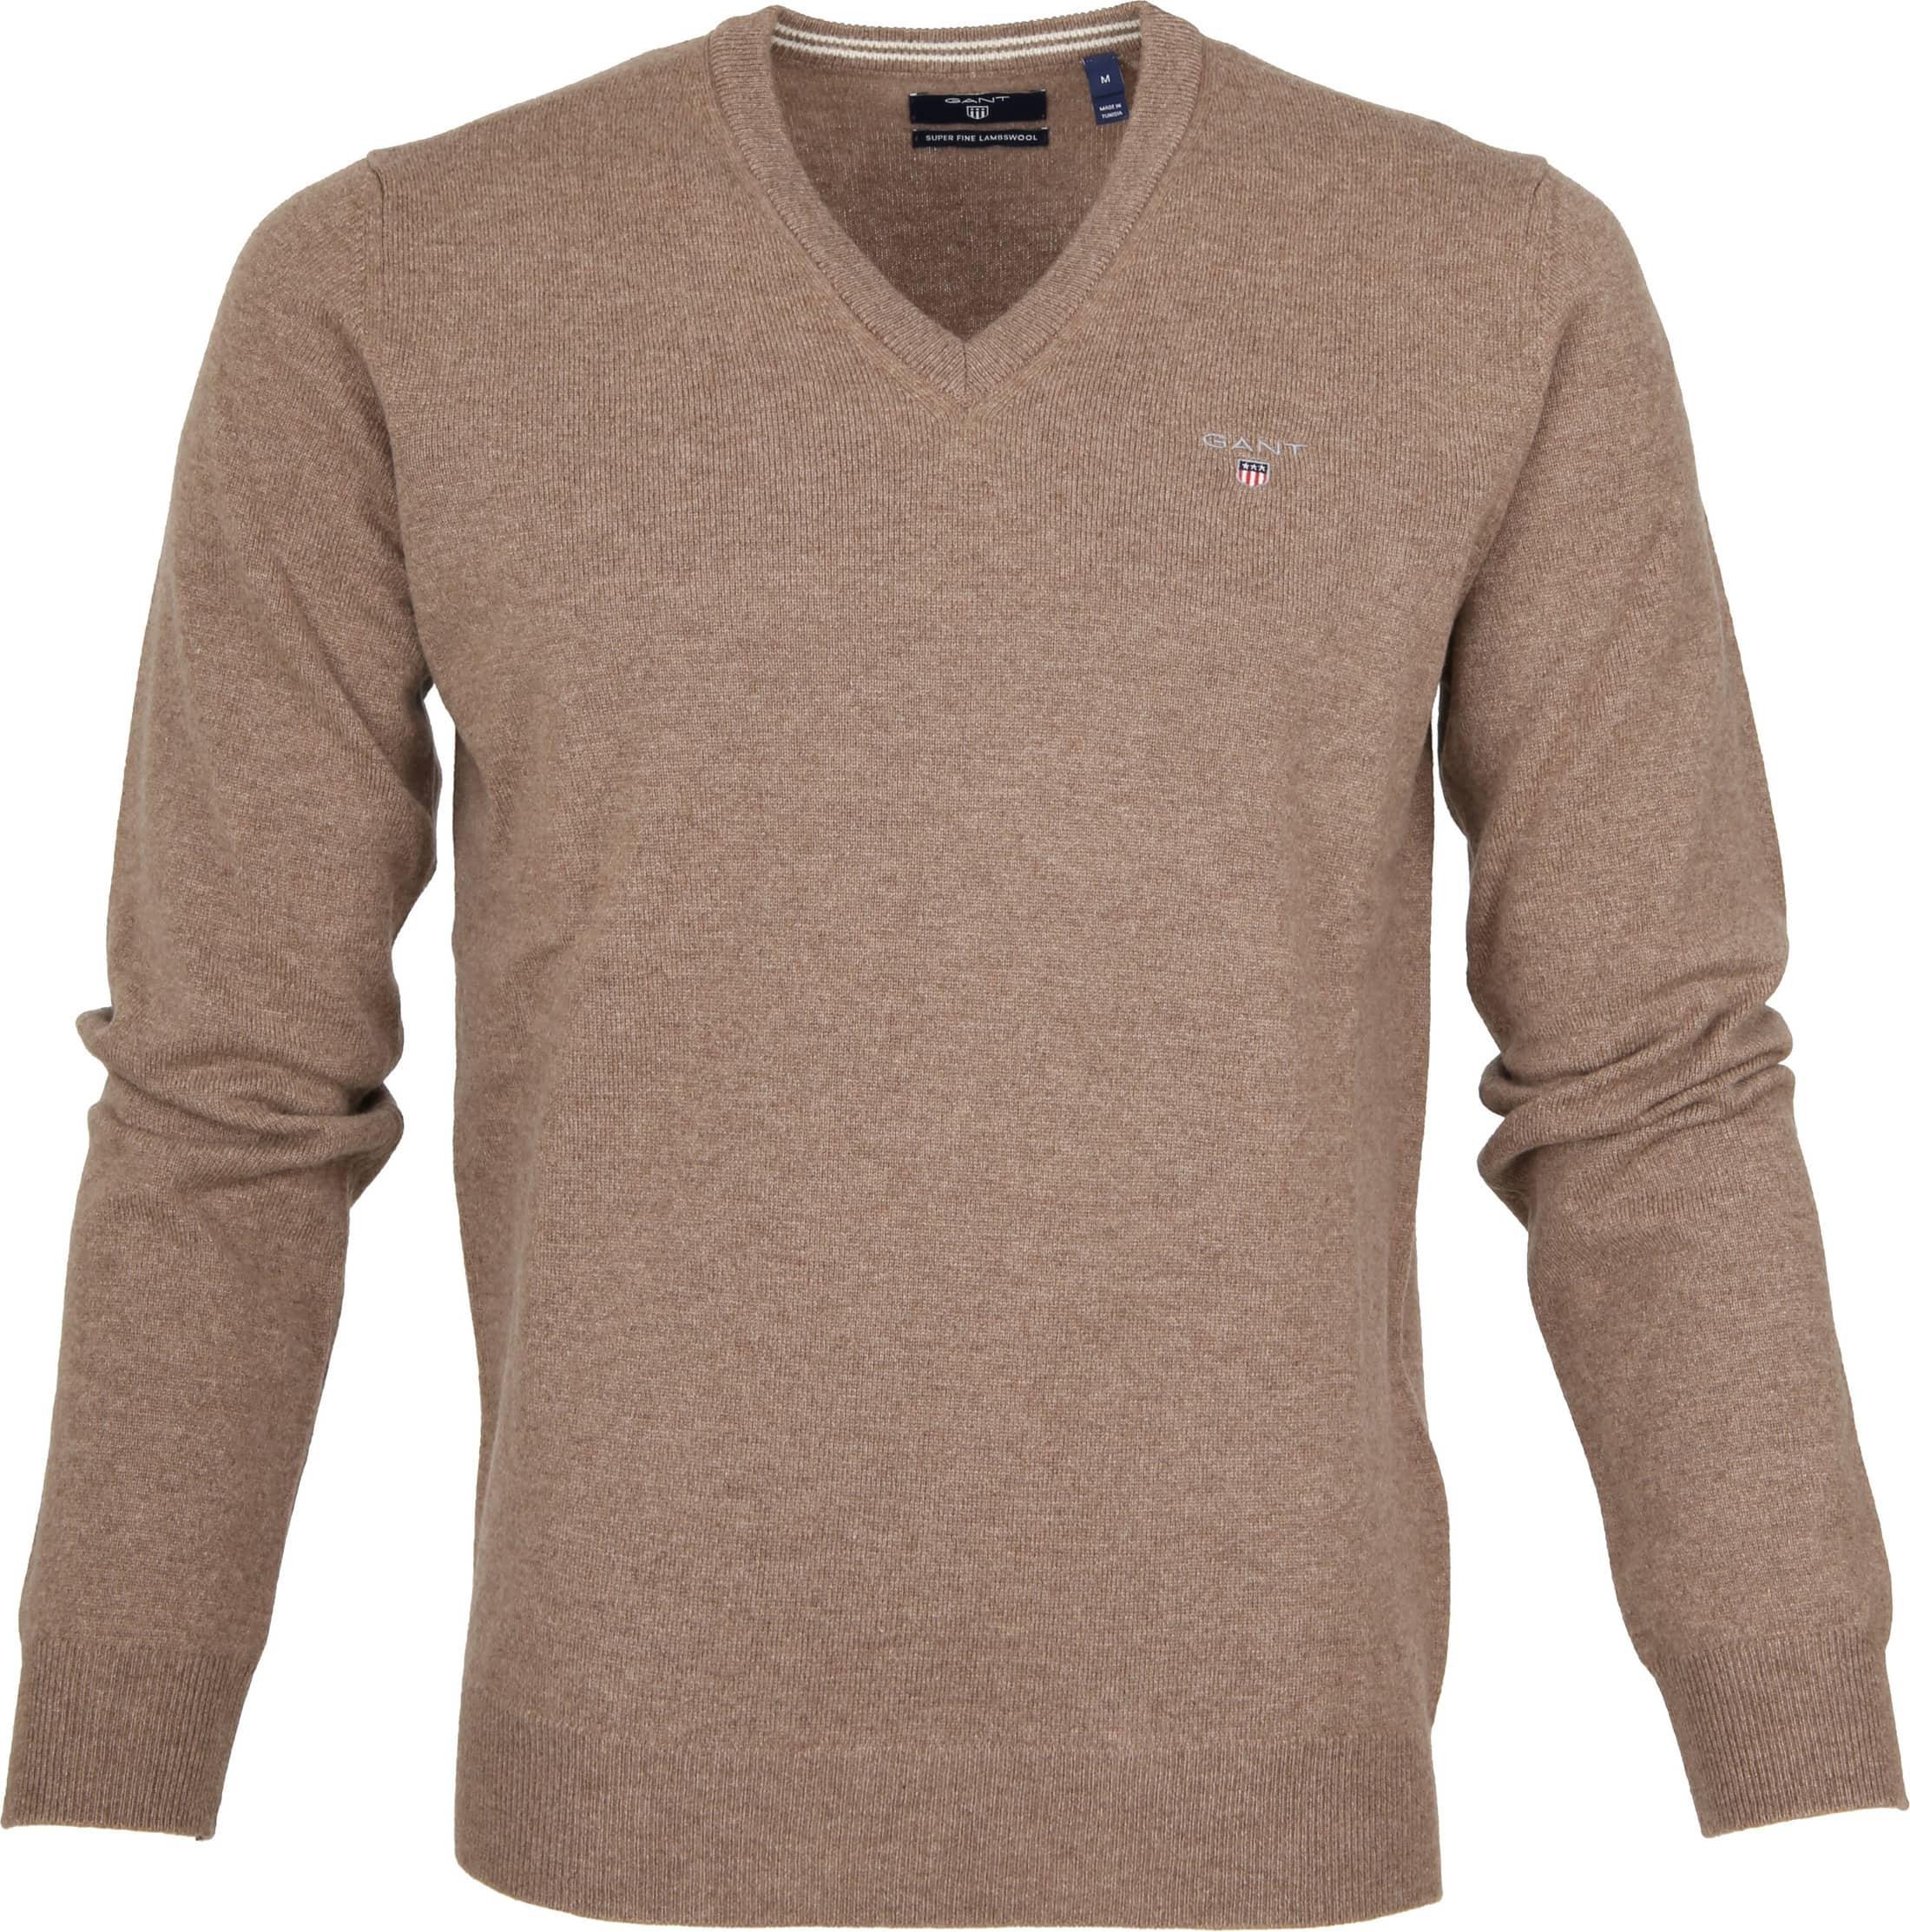 Gant Pullover Lambswool Seawood 86212 290 order online